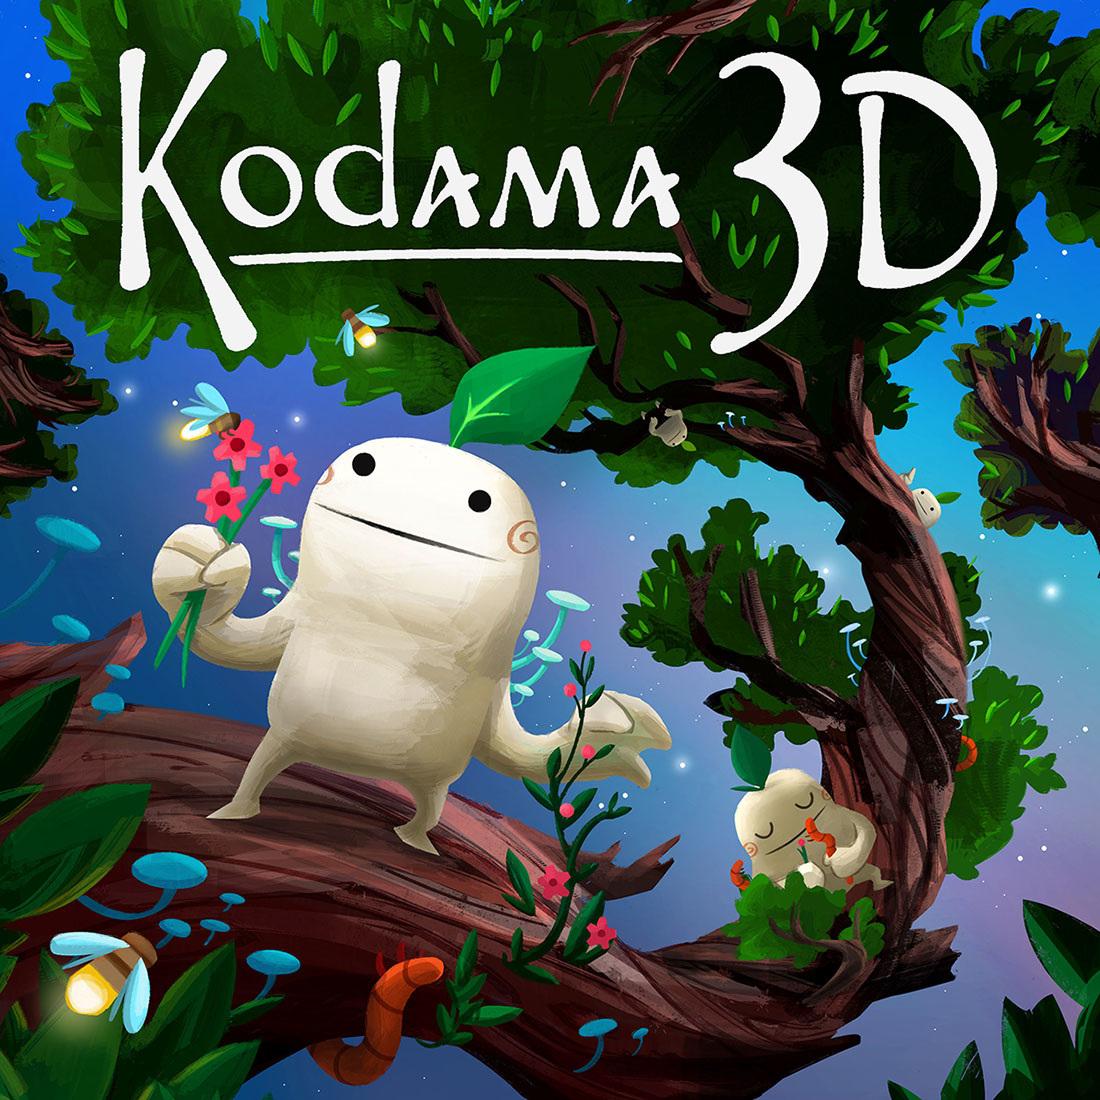 Kodama3D_BoxCover_v3d-copy_1100.jpg